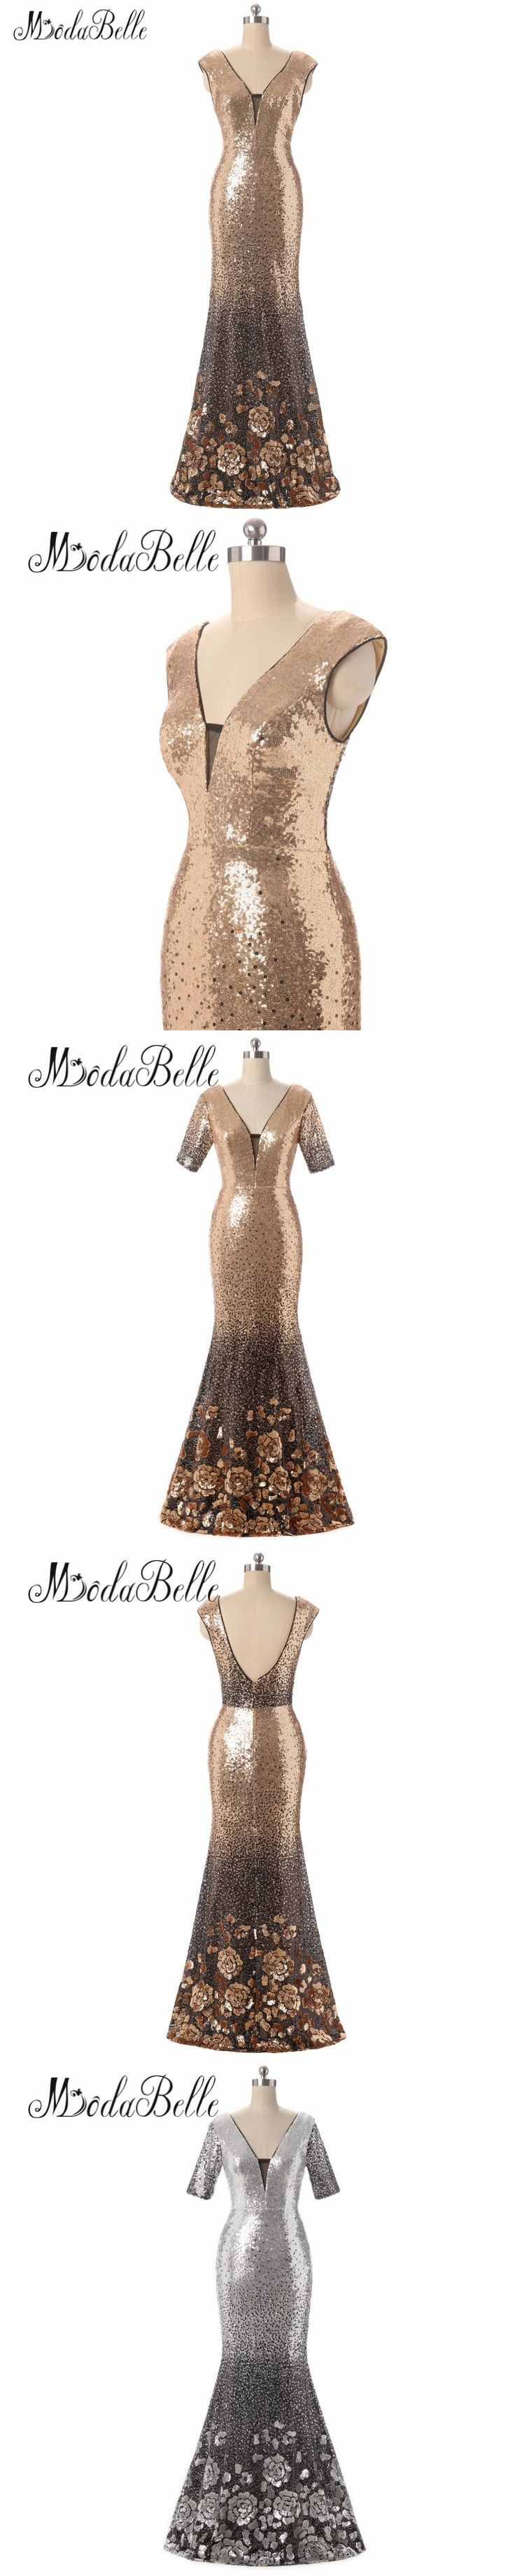 modabelle Silver/Gold Bridesmaid Dresses Long Party Gown With Sequins Robe Demoiselle D'honneur Party Wedding Guest Dress 2018